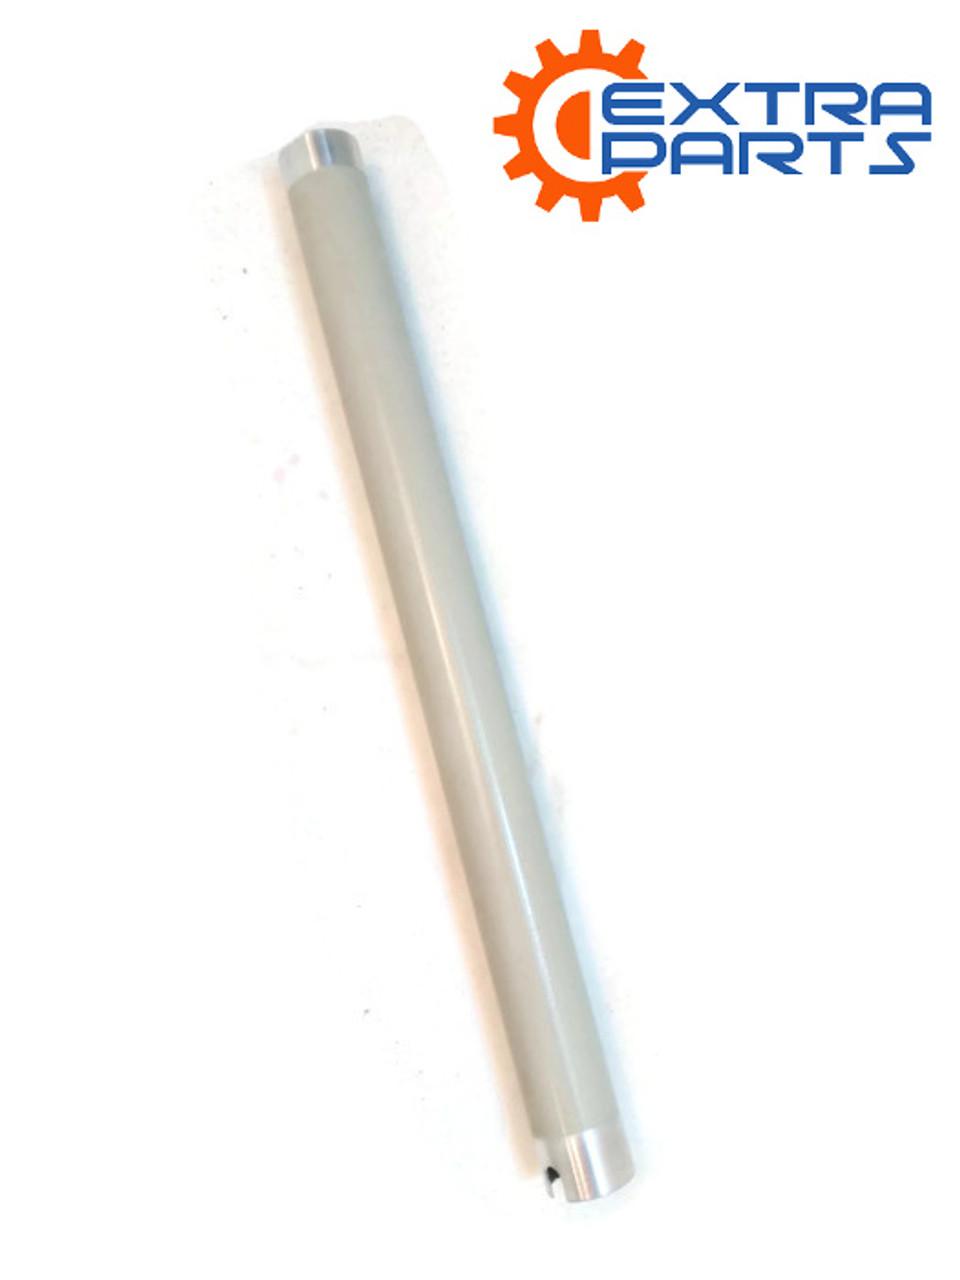 JC66-00601A Upper Fuser Roller, SCX-4200-OEM Replacement